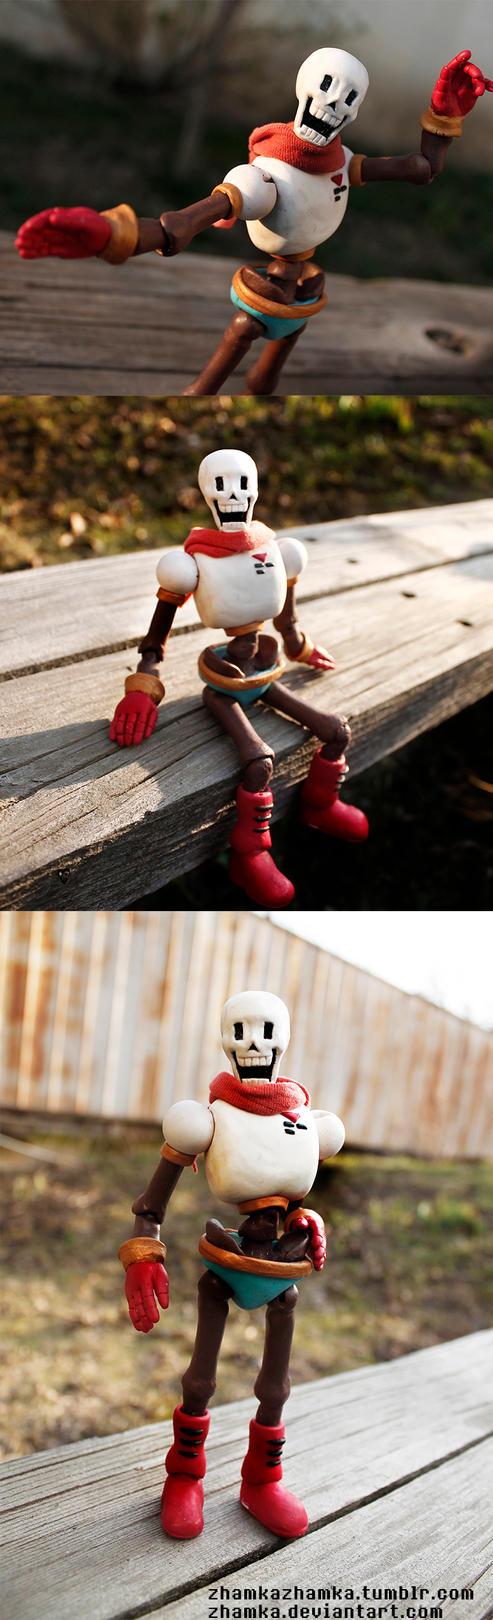 Papyrus Ball Jointed Doll by Zhamka